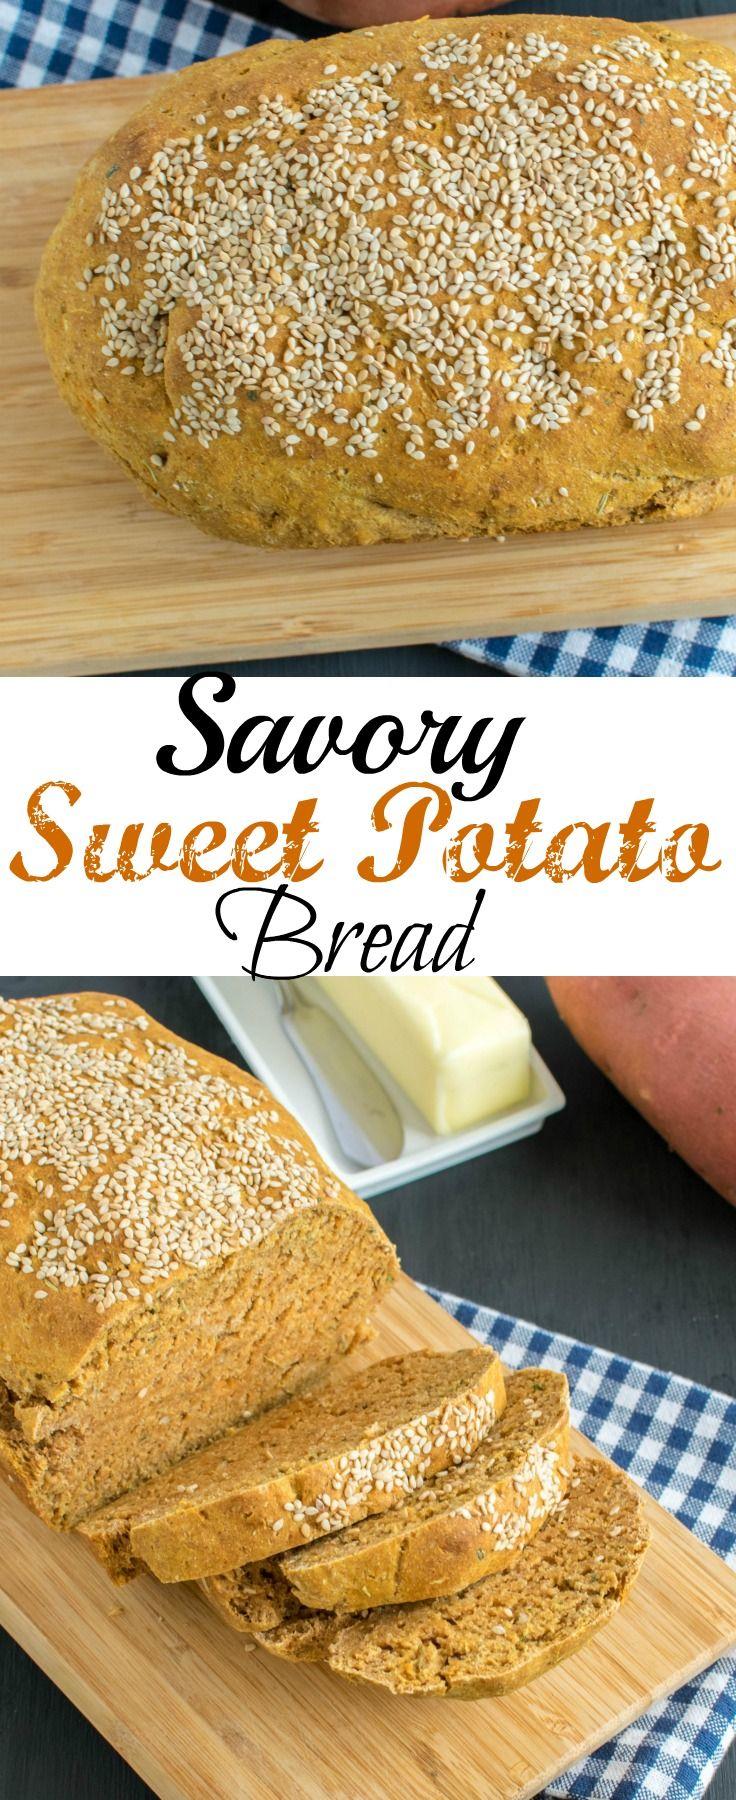 Savory Sweet Potato Bread